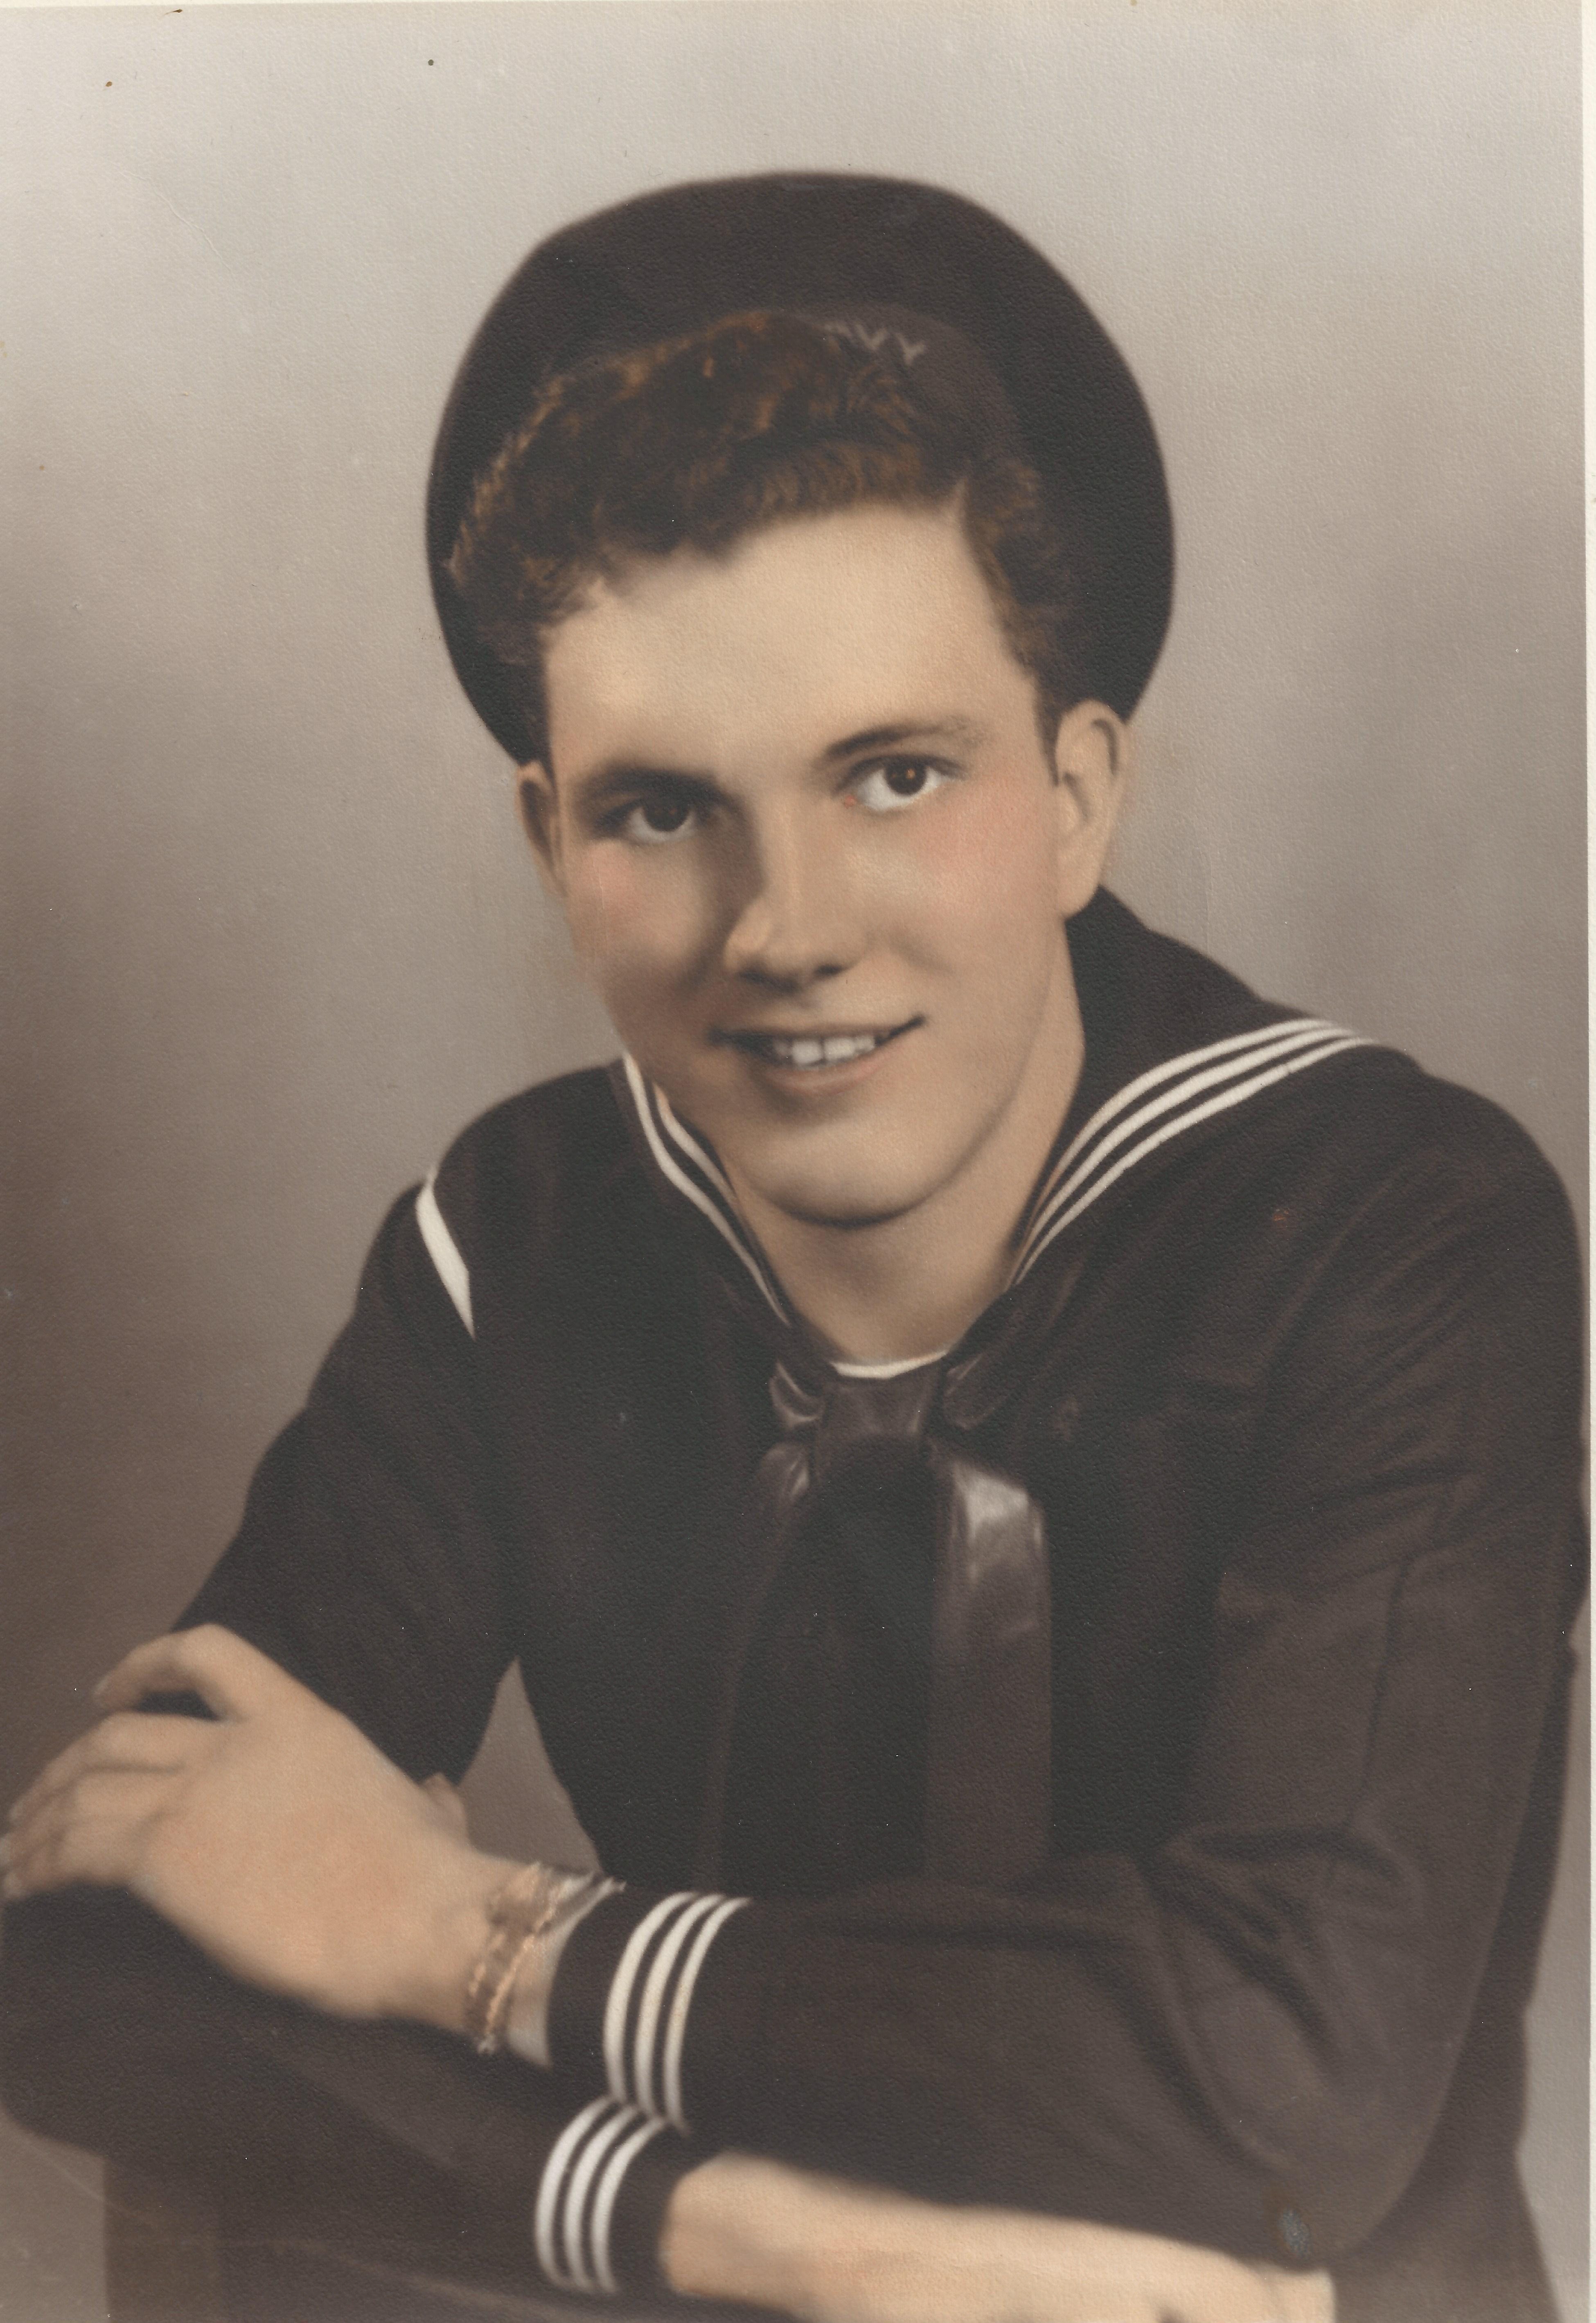 Richard R. Harwood